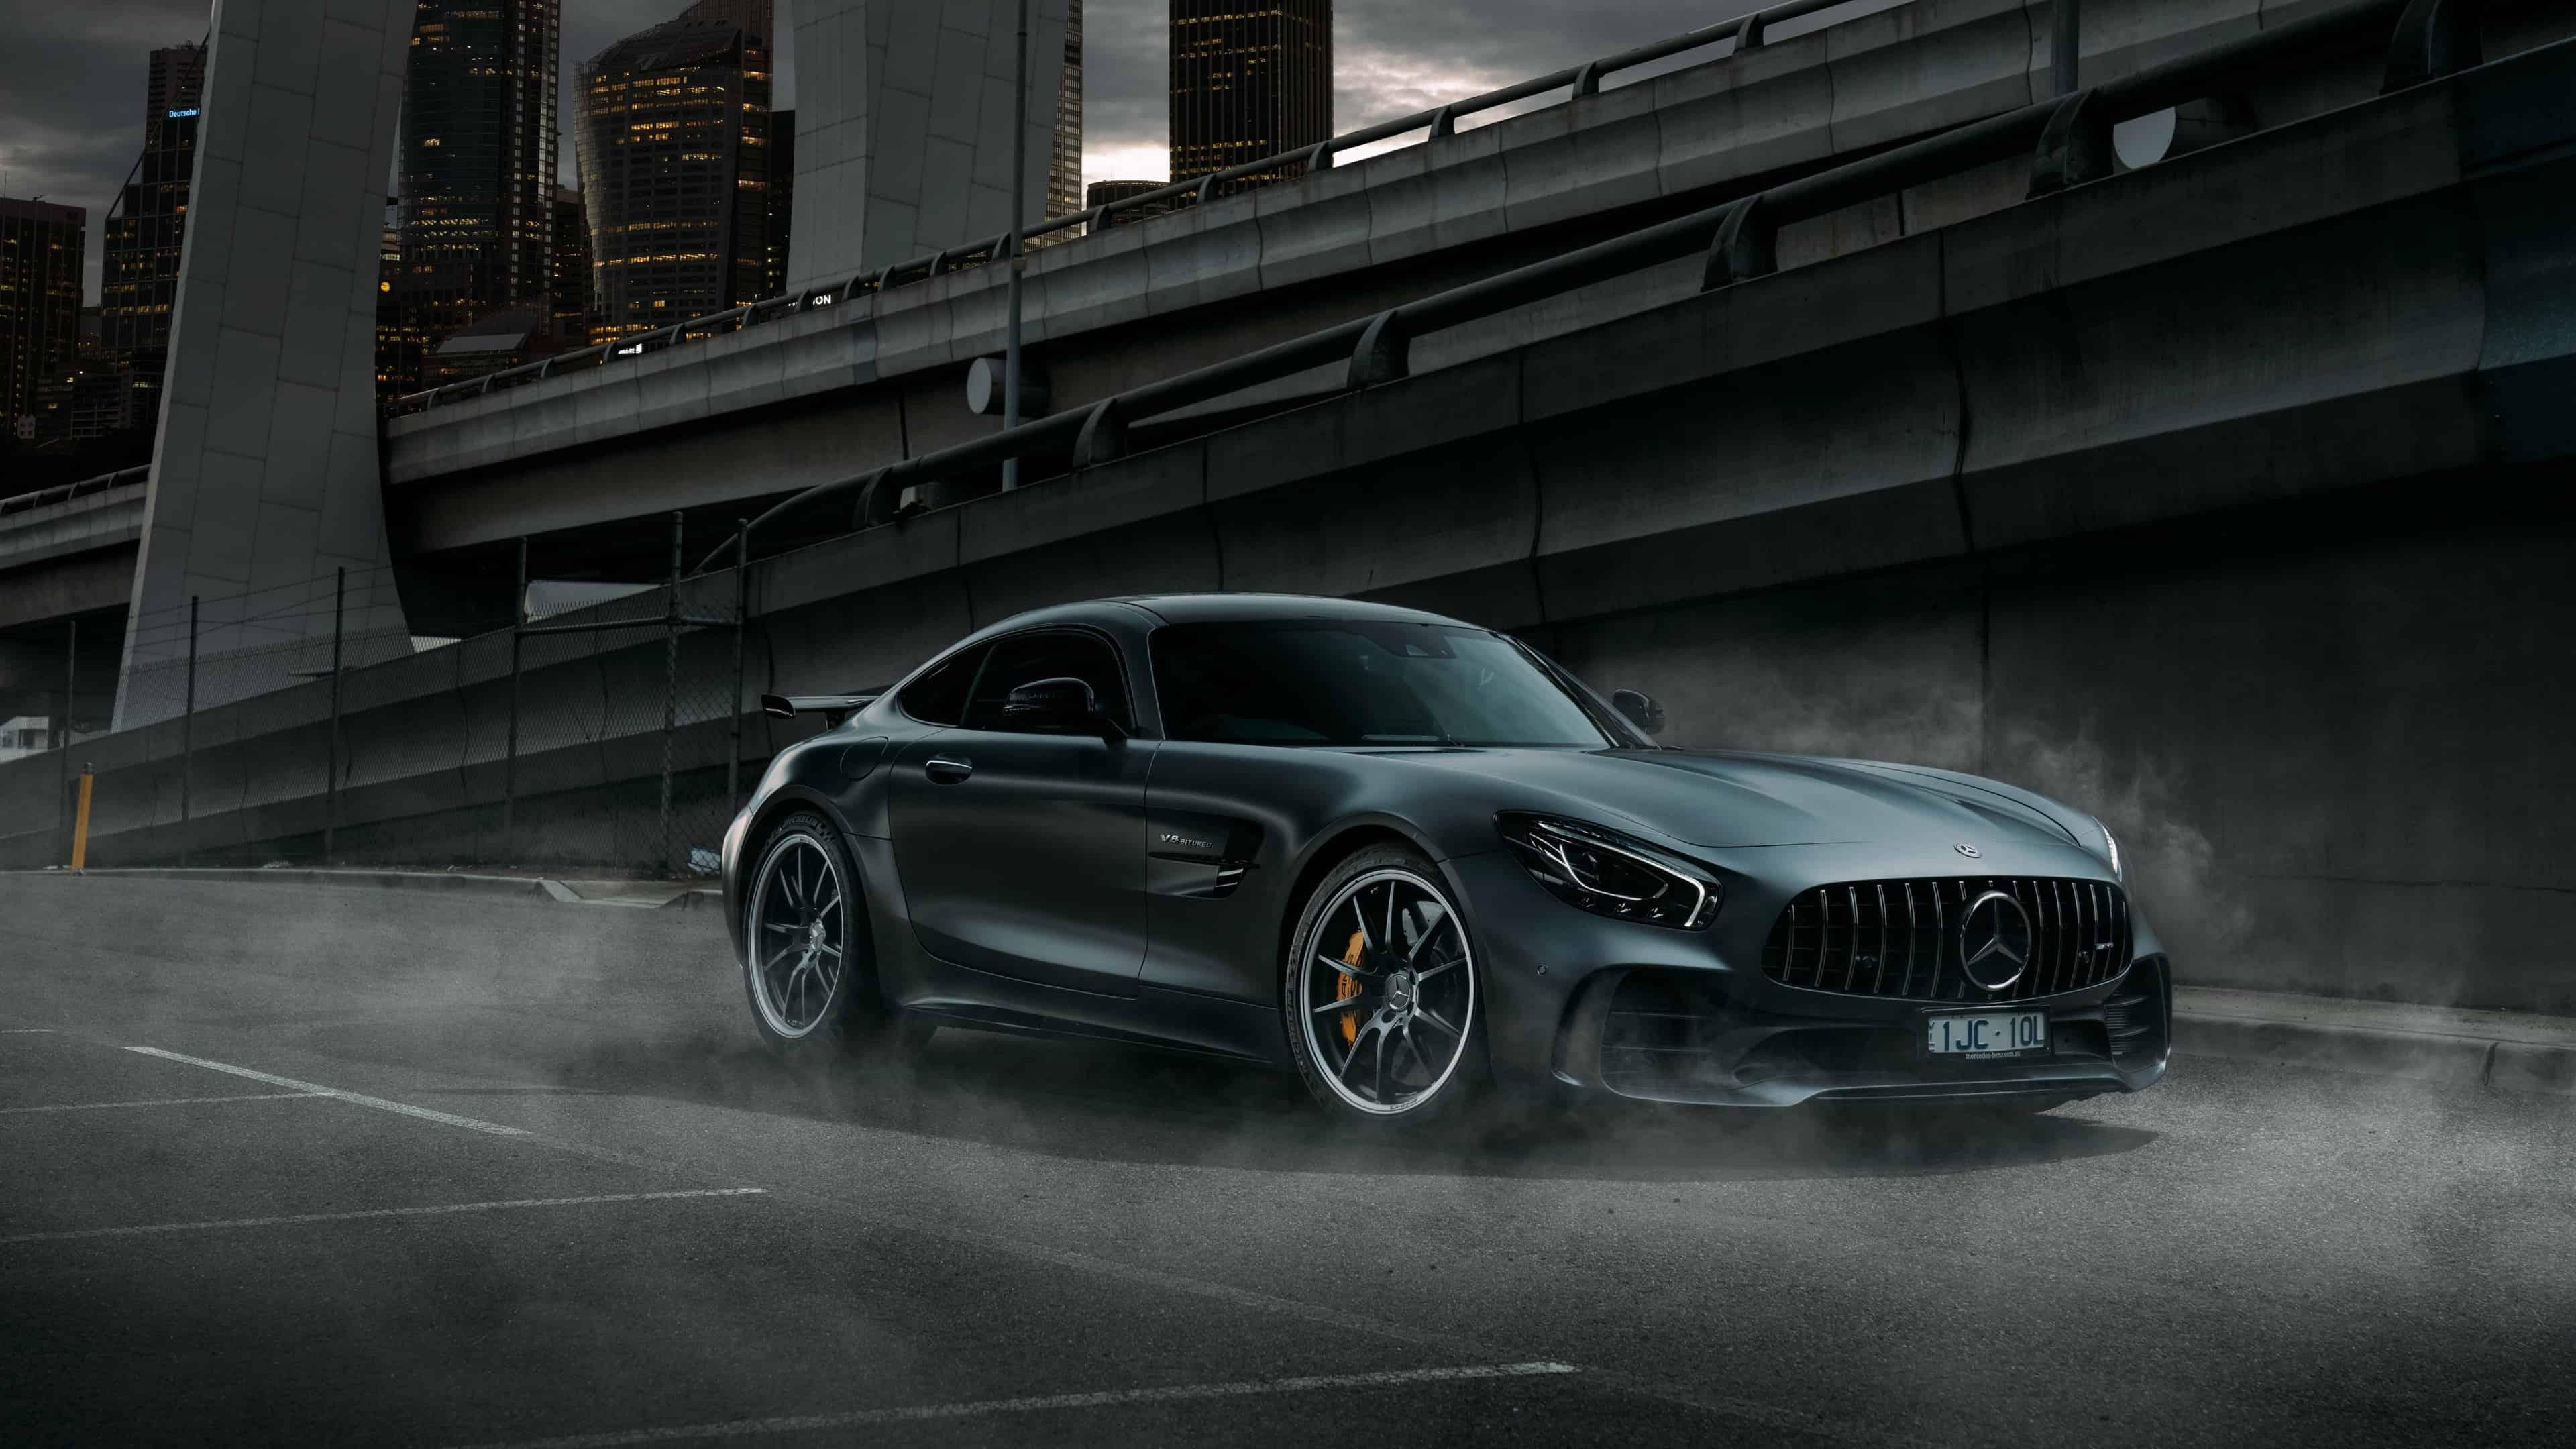 Mercedes Benz GT R AMG UHD 4K Wallpaper | Pixelz